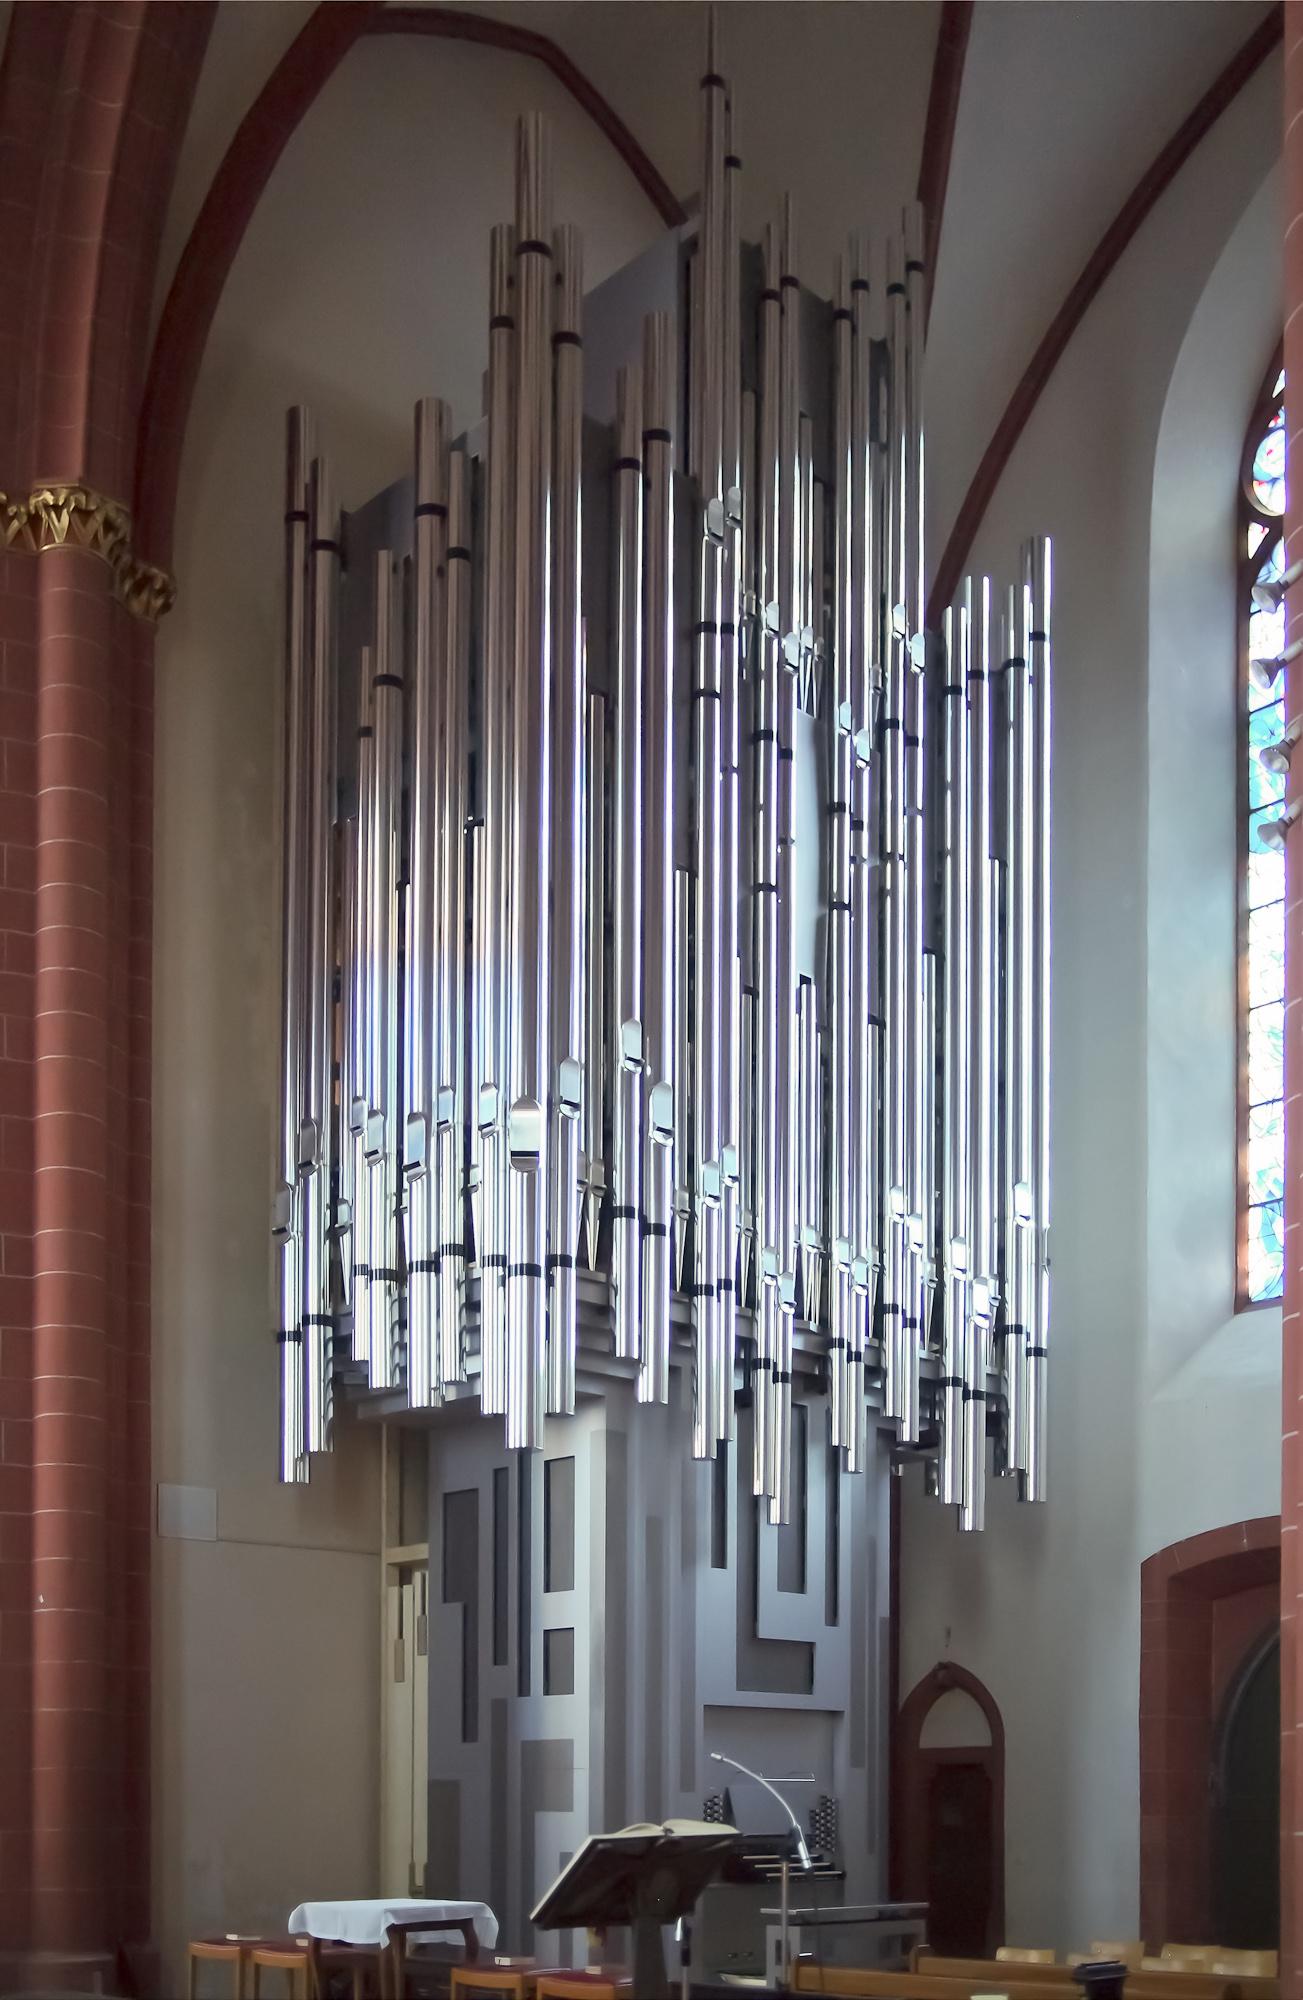 File Klais Orgel St Stephan Mainz Jpg Wikimedia Commons